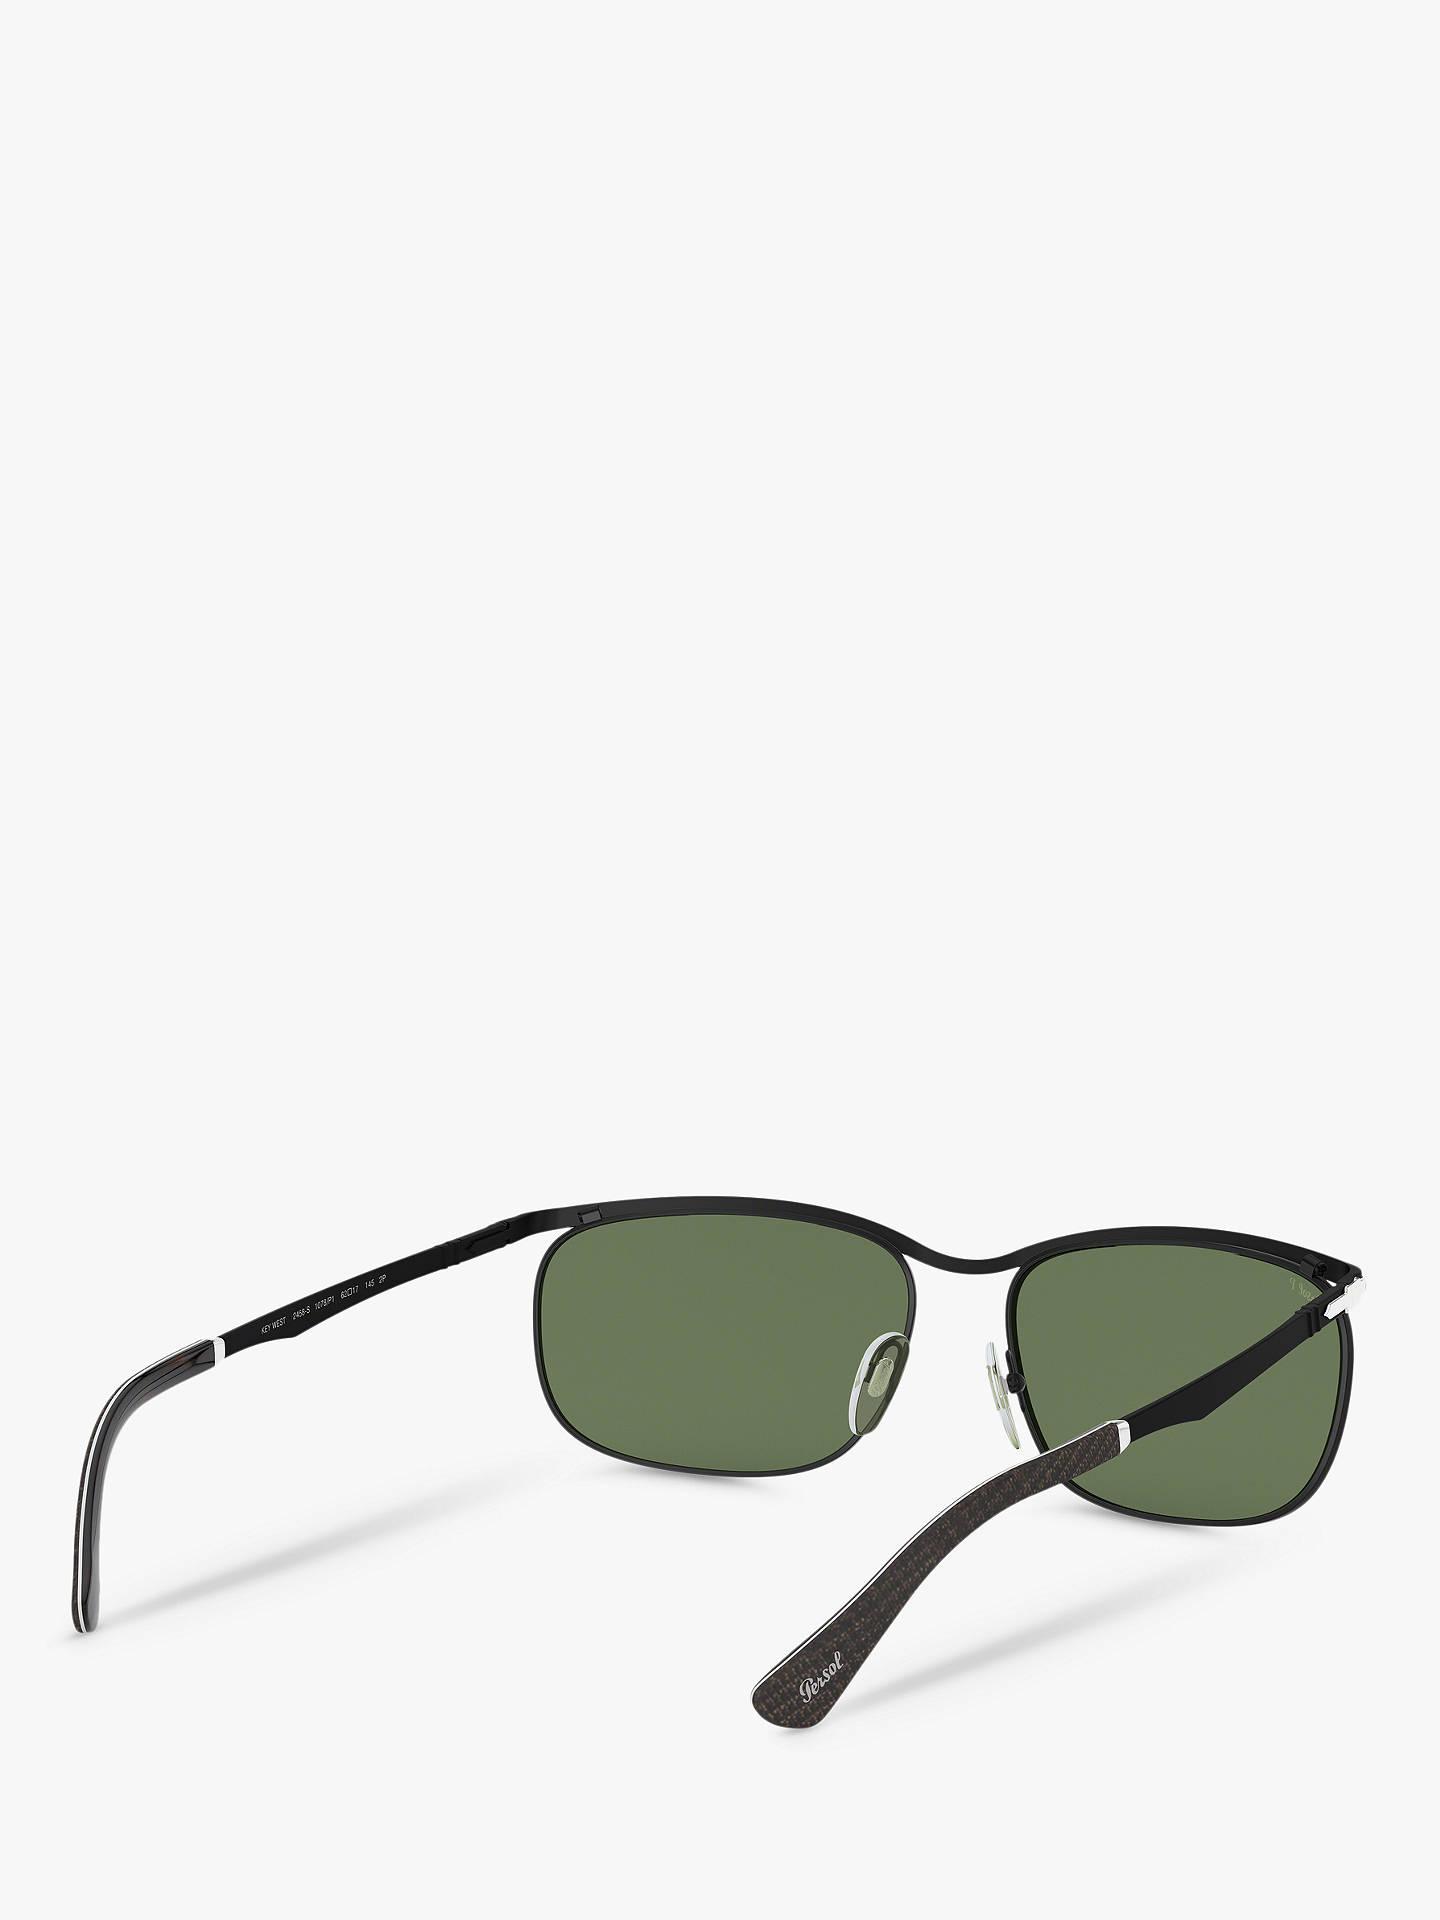 16d3ae0a096d ... Buy Persol PO2458S Men's Polarised Rectangular Sunglasses, Black/Green  Online at johnlewis. ...